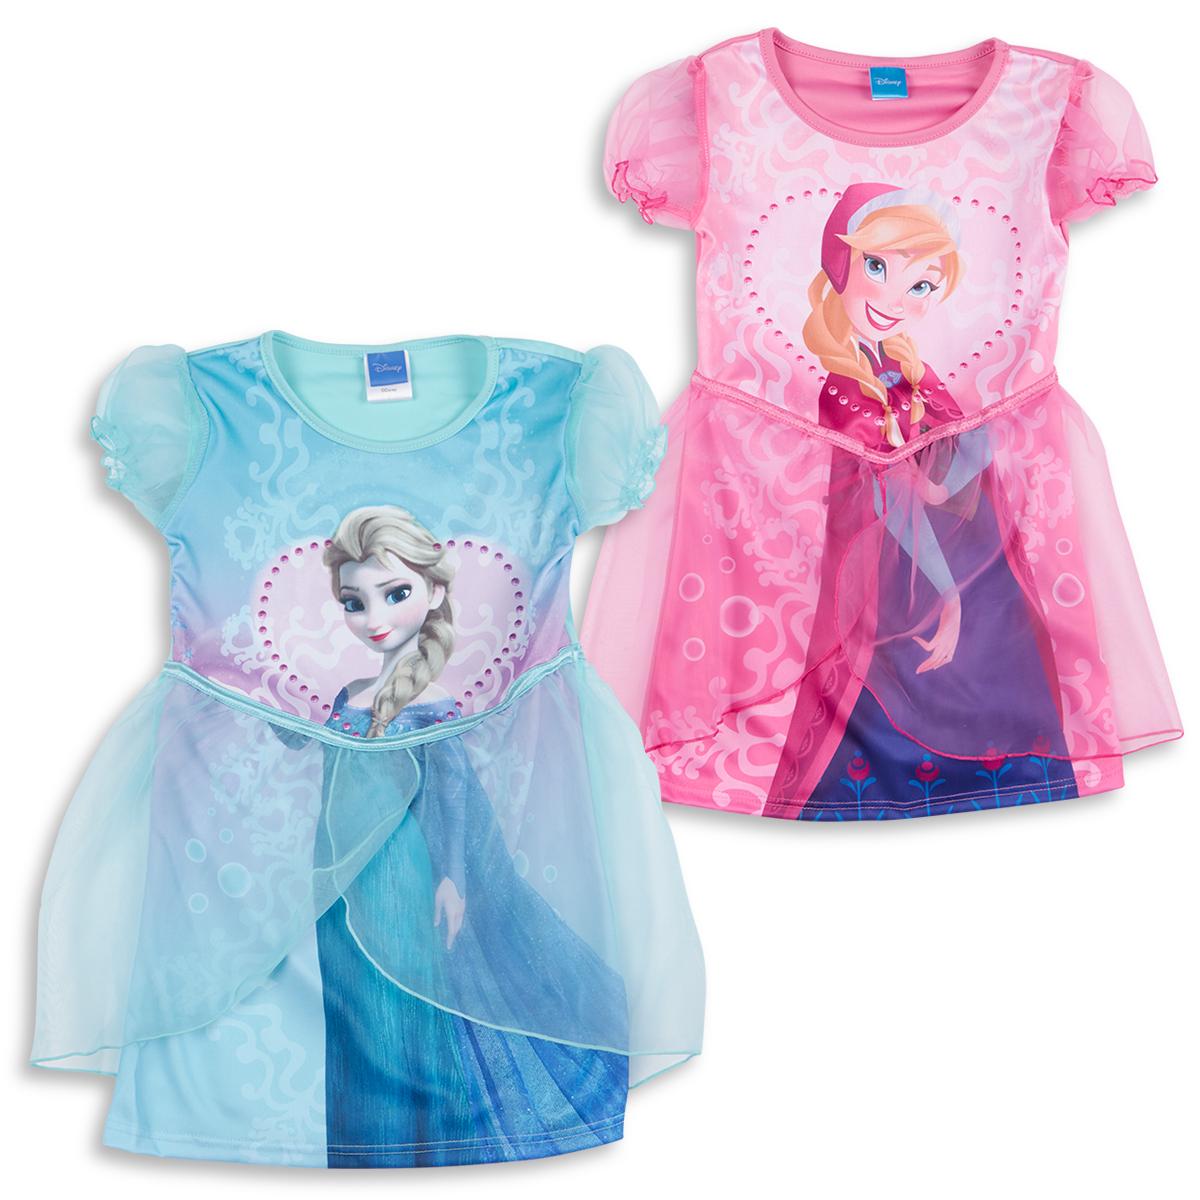 Disney Princess Frozen Girls Fancy Dress Up Costume Elsa Anna Party Outfit